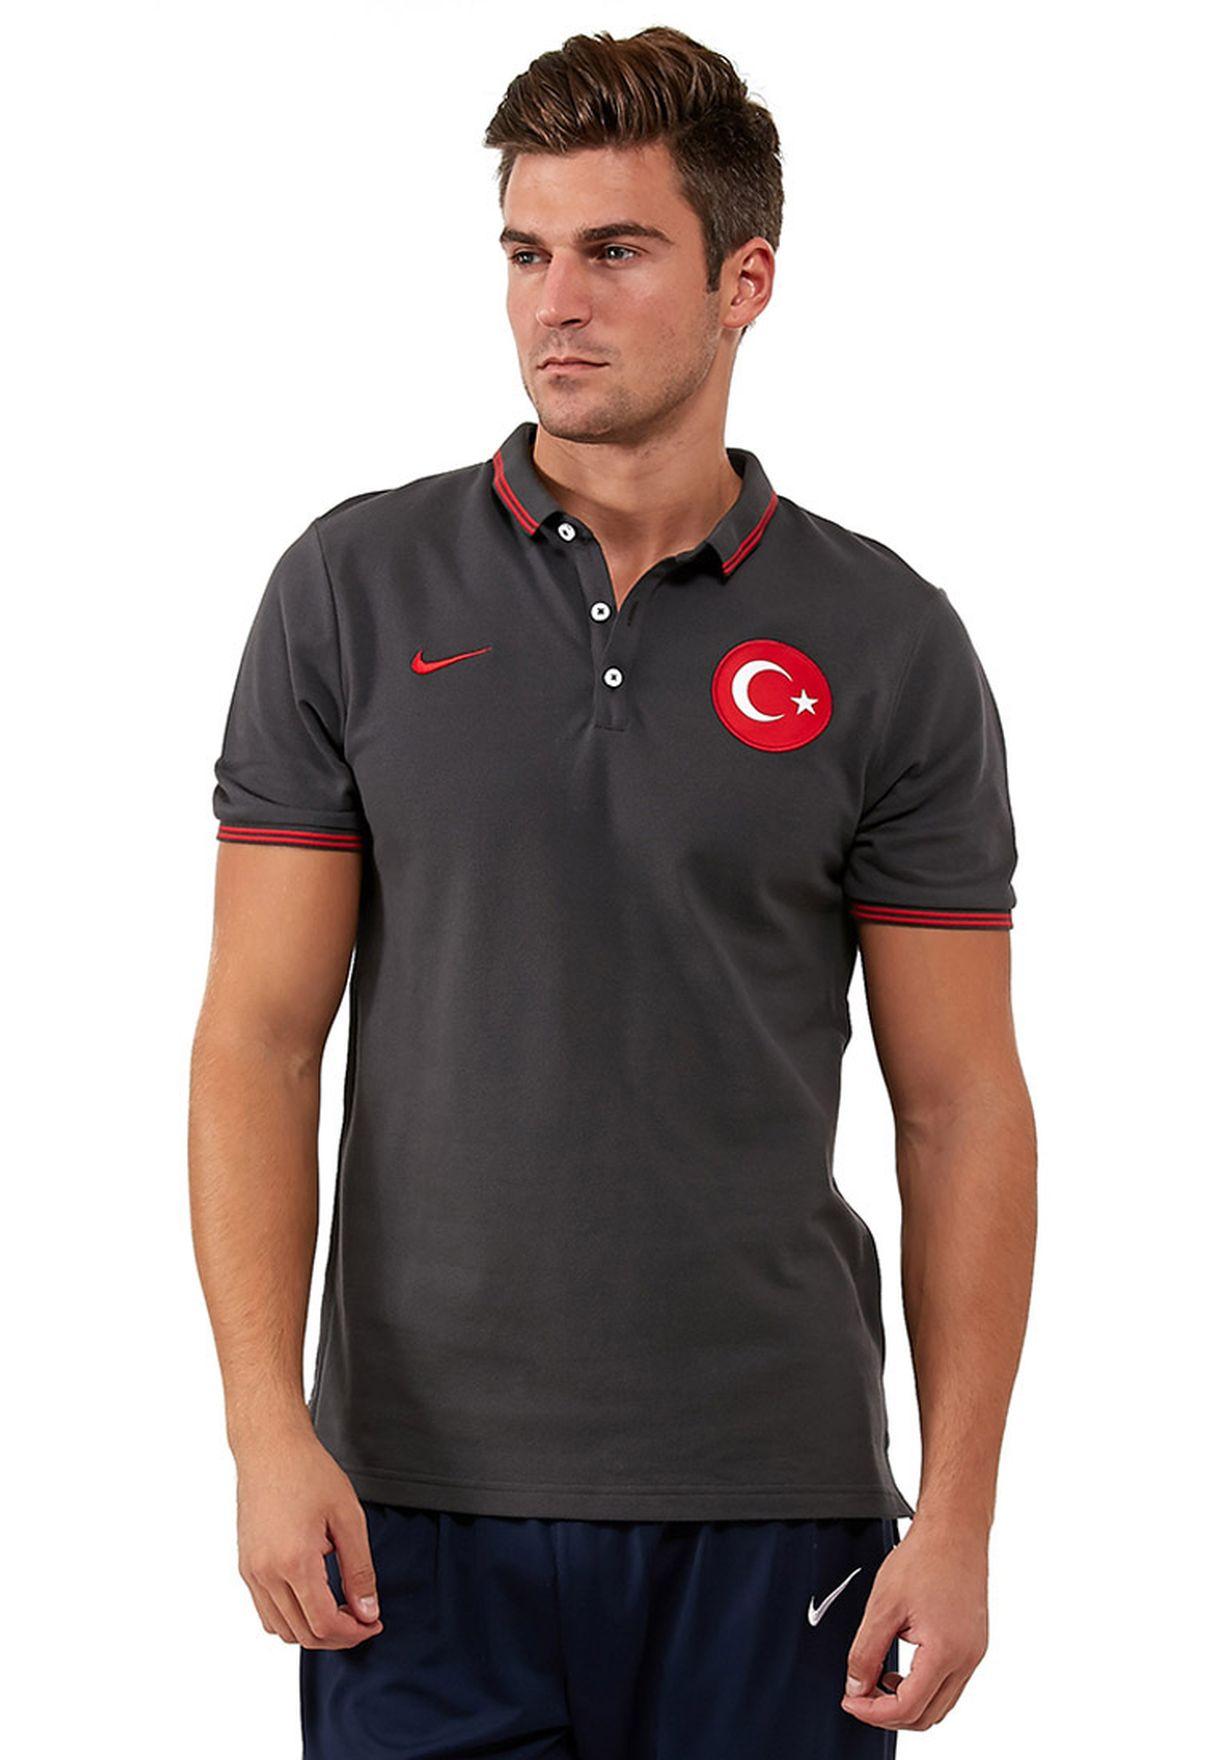 9c4be25b3 تسوق قميص بولو Turkey Auth ماركة نايك لون رمادي NKAP605345-060 في ...